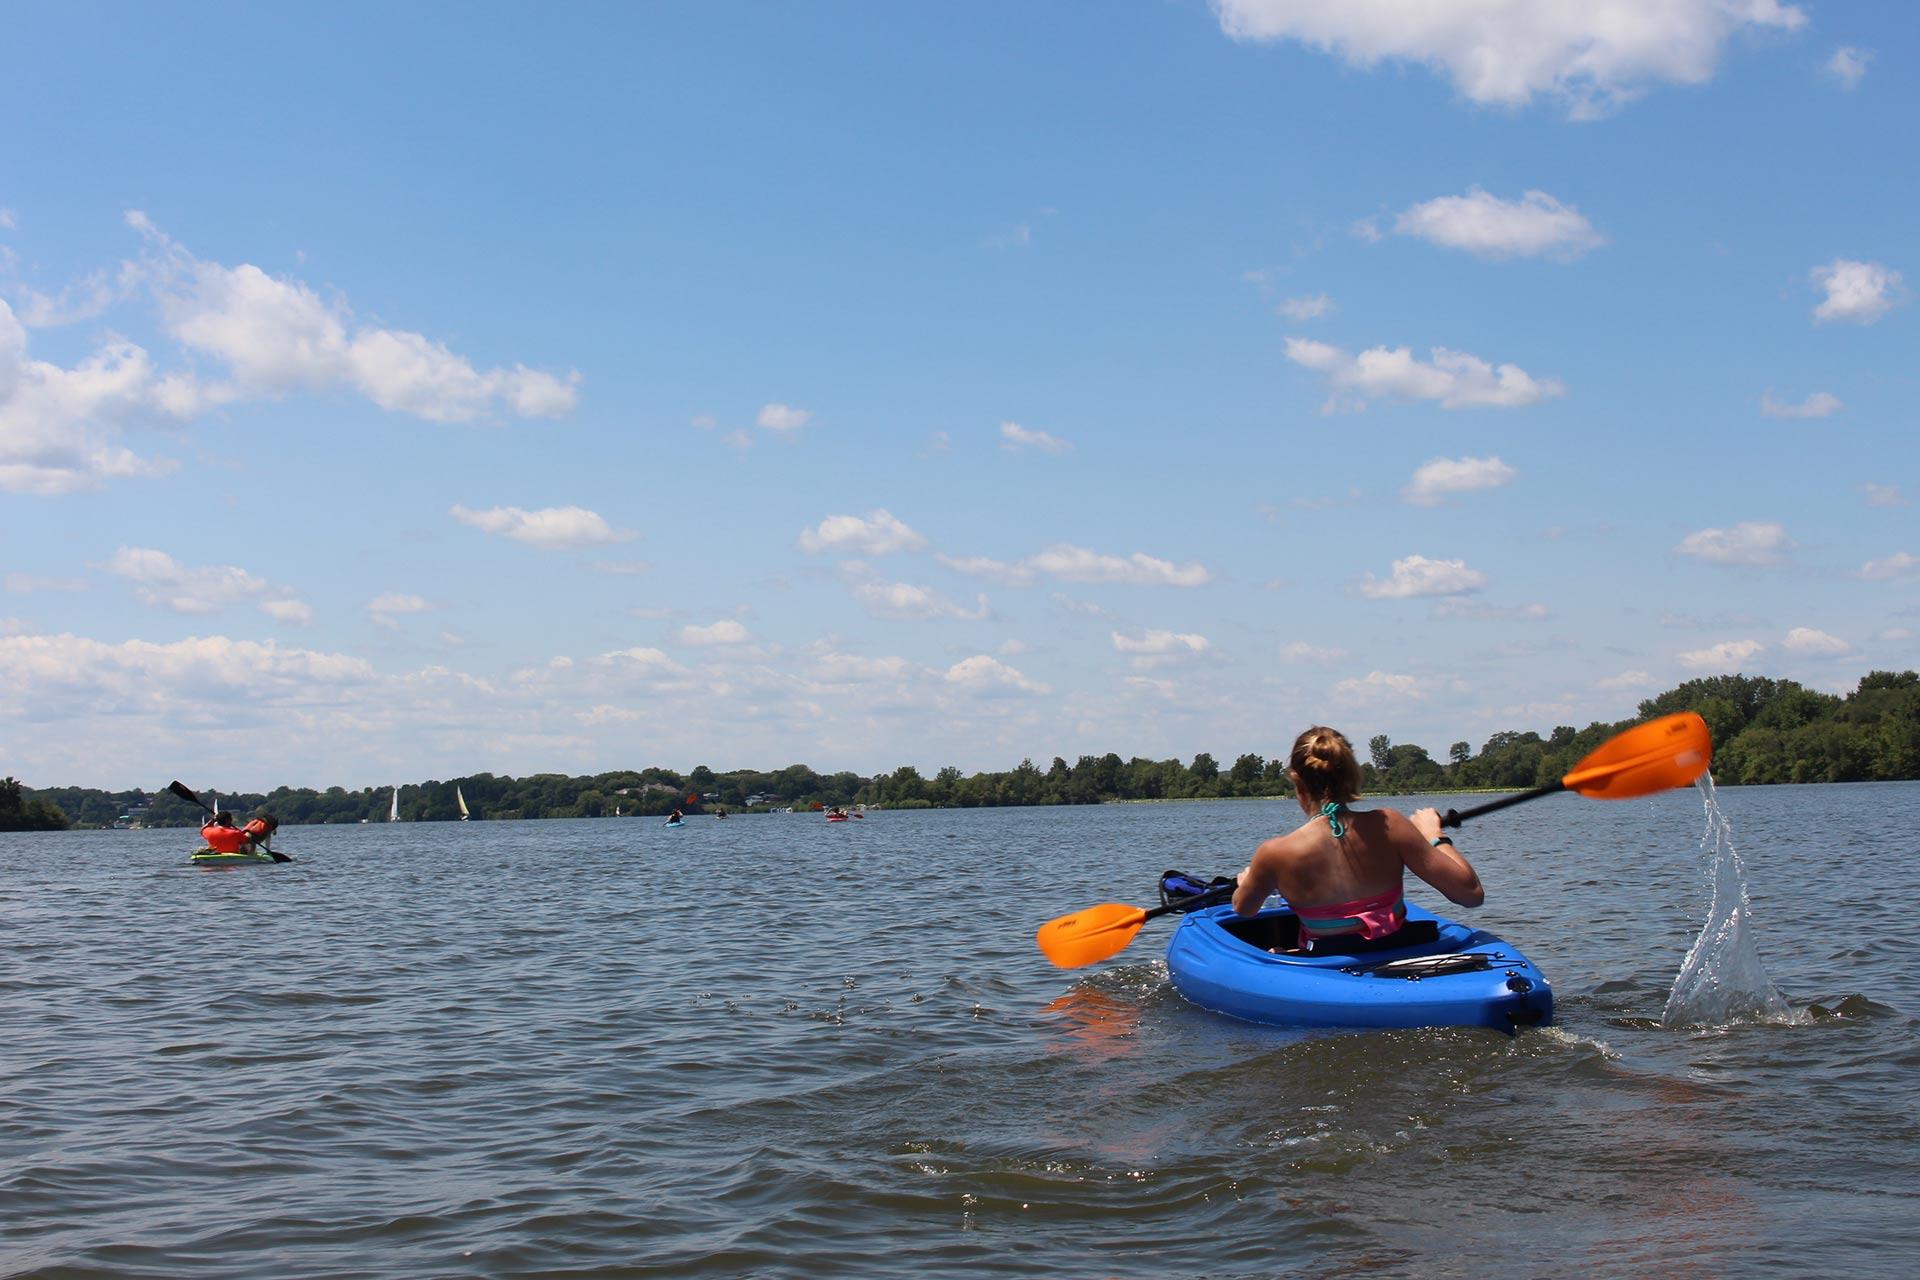 Clear Lake, Iowa; Photo Courtesy of Kailey Knetzer/Shutterstock.com